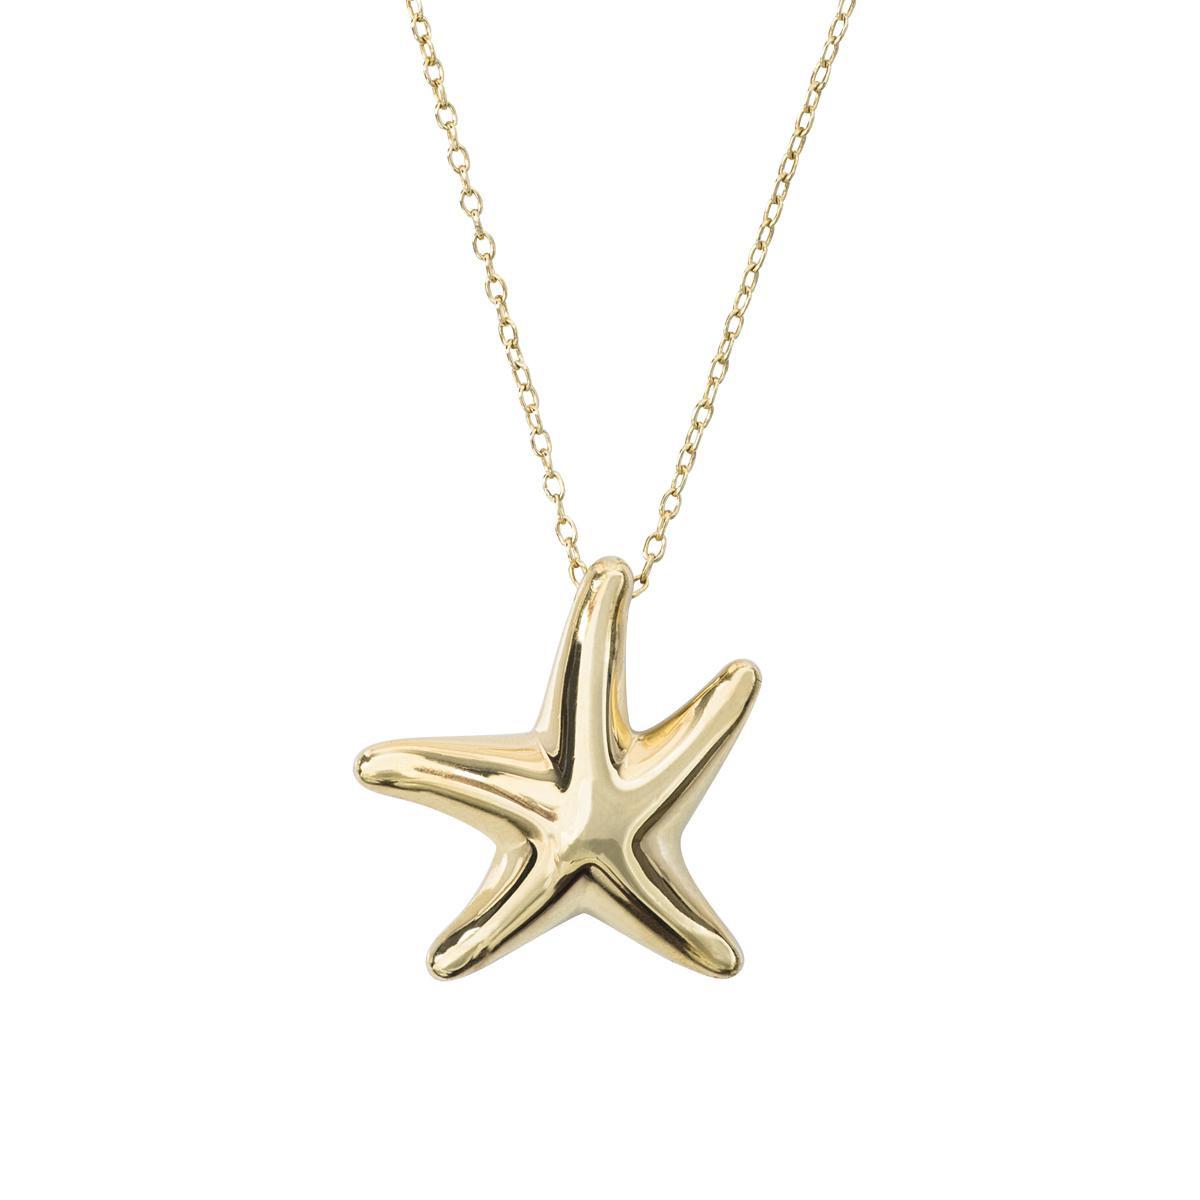 Vintage Tiffany & Co. Starfish Pendant